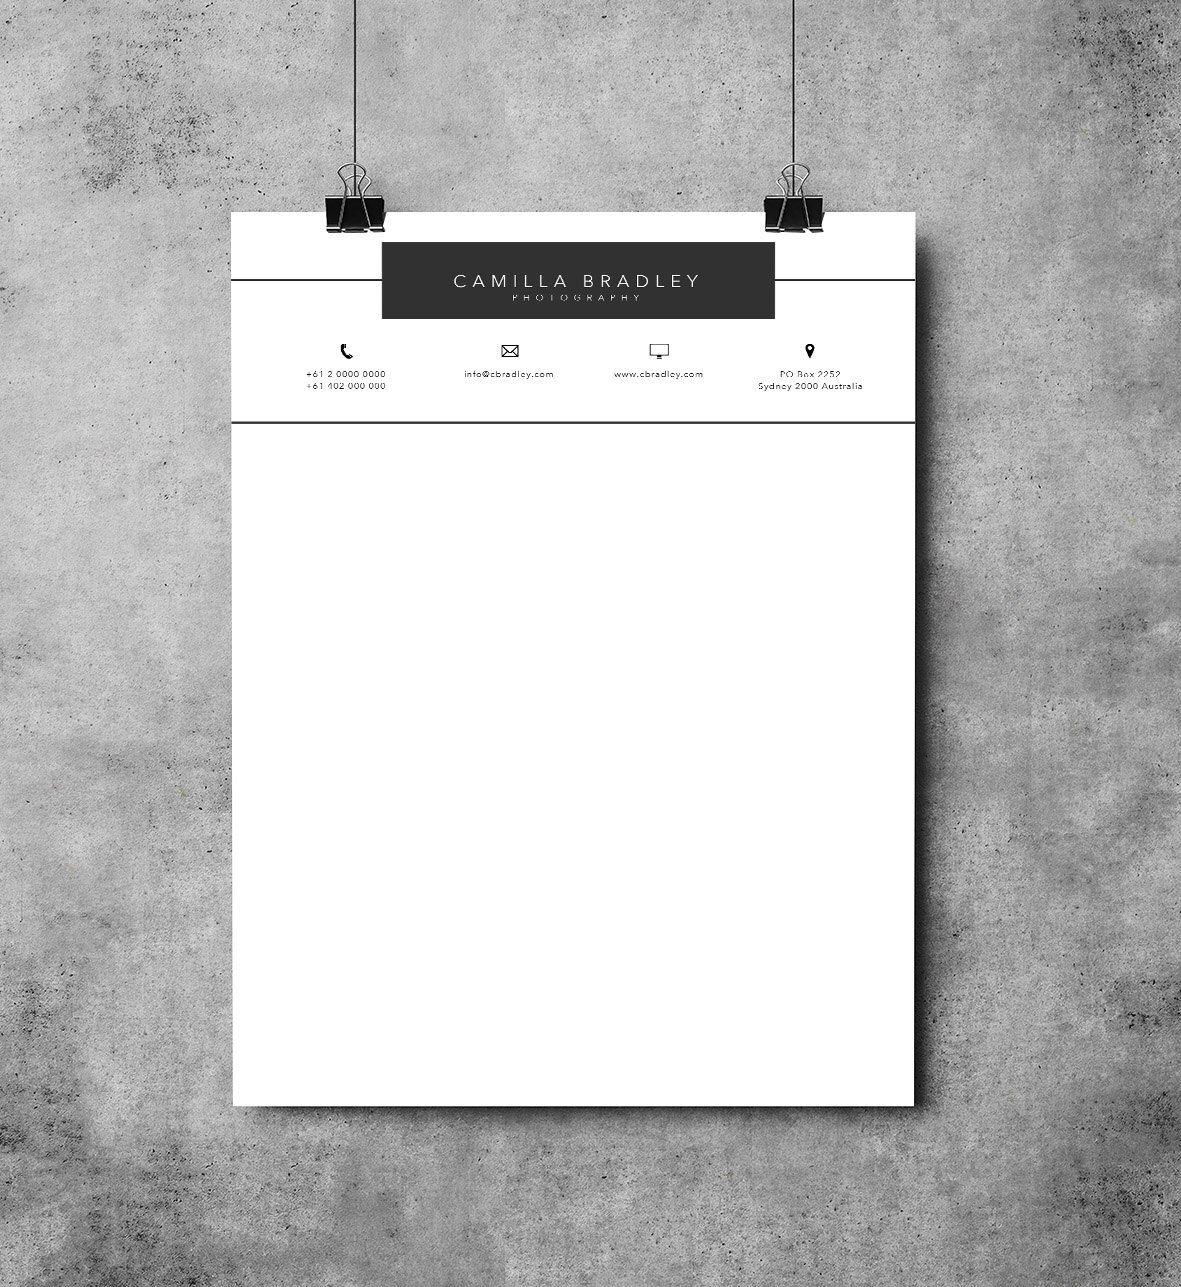 Ms word letterhead templates demirediffusion letterhead template printable letterhead design microsoft word maxwellsz